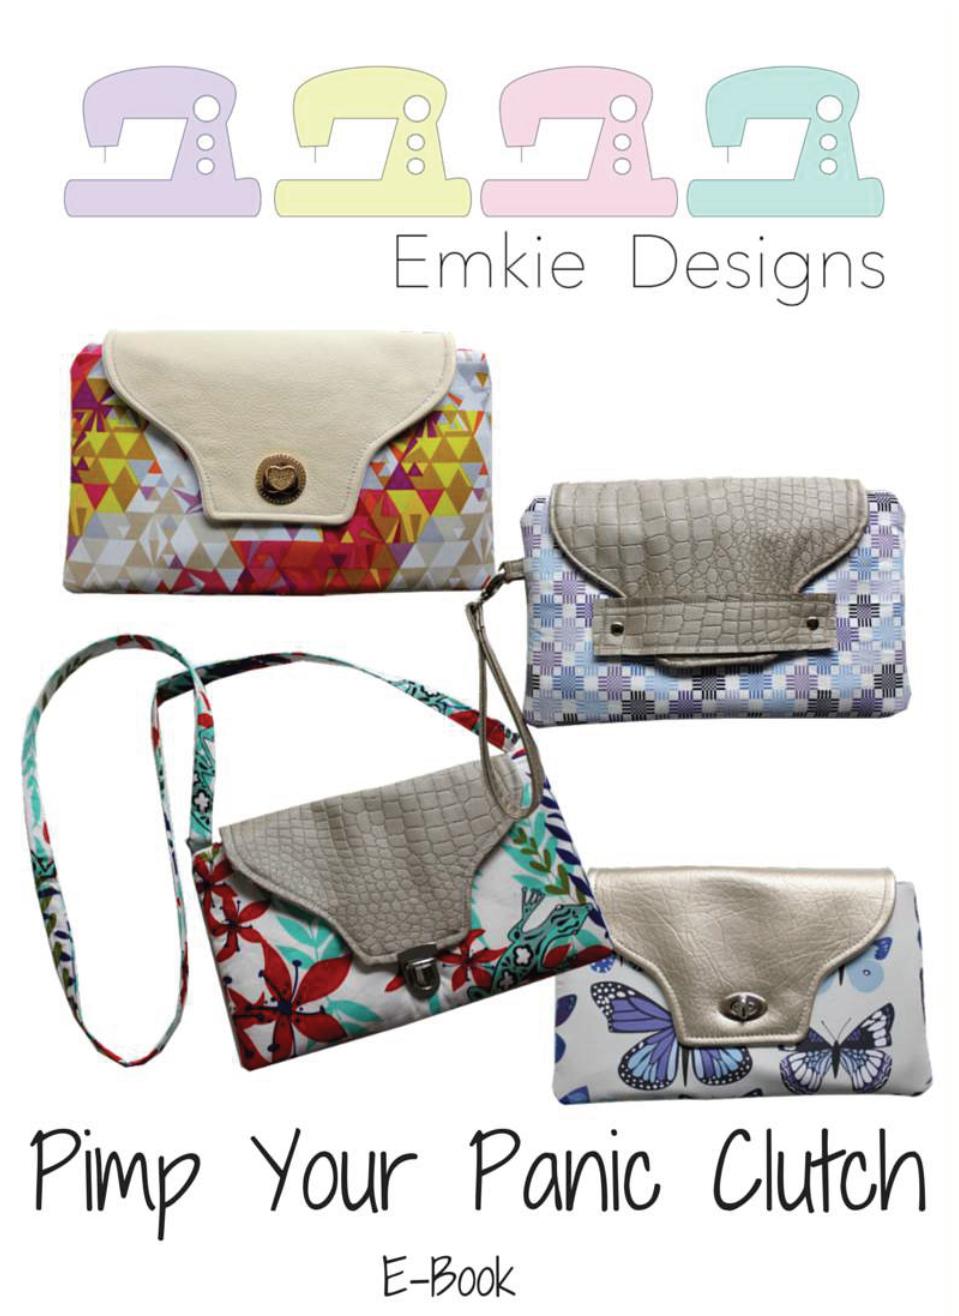 Emkie Designs 1.png